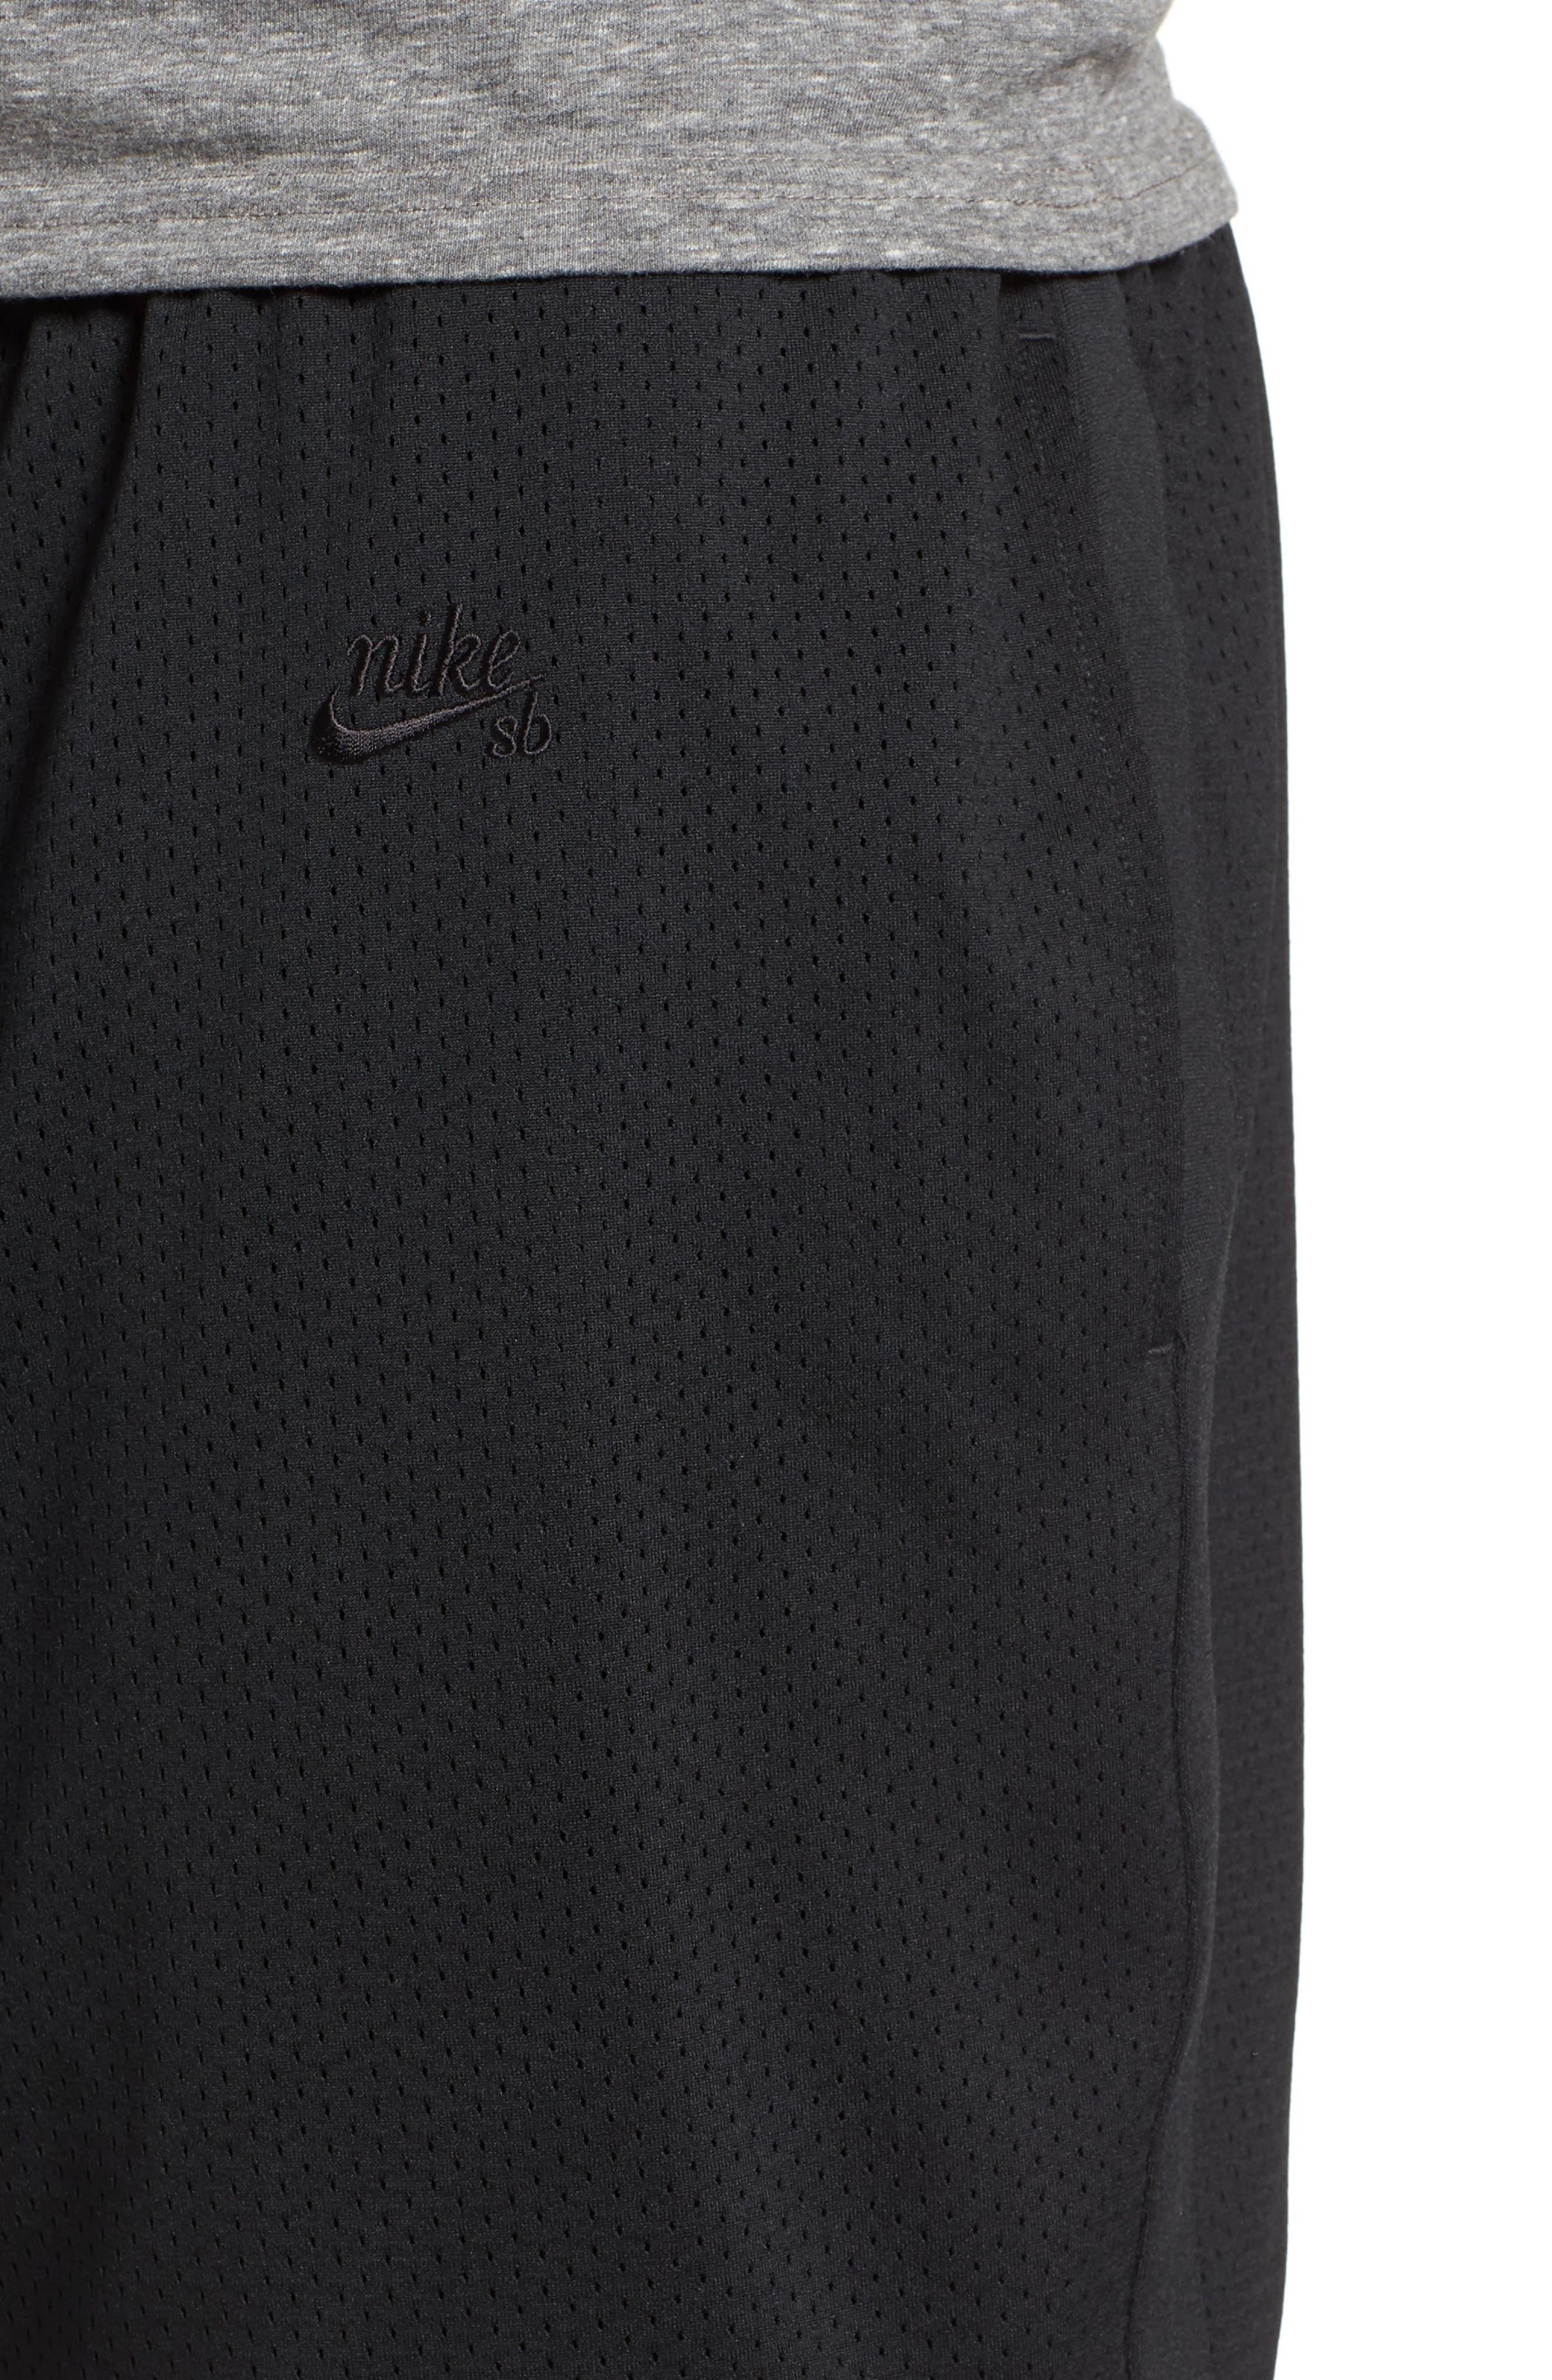 SB Dry Heritage Court Shorts,                             Alternate thumbnail 4, color,                             010